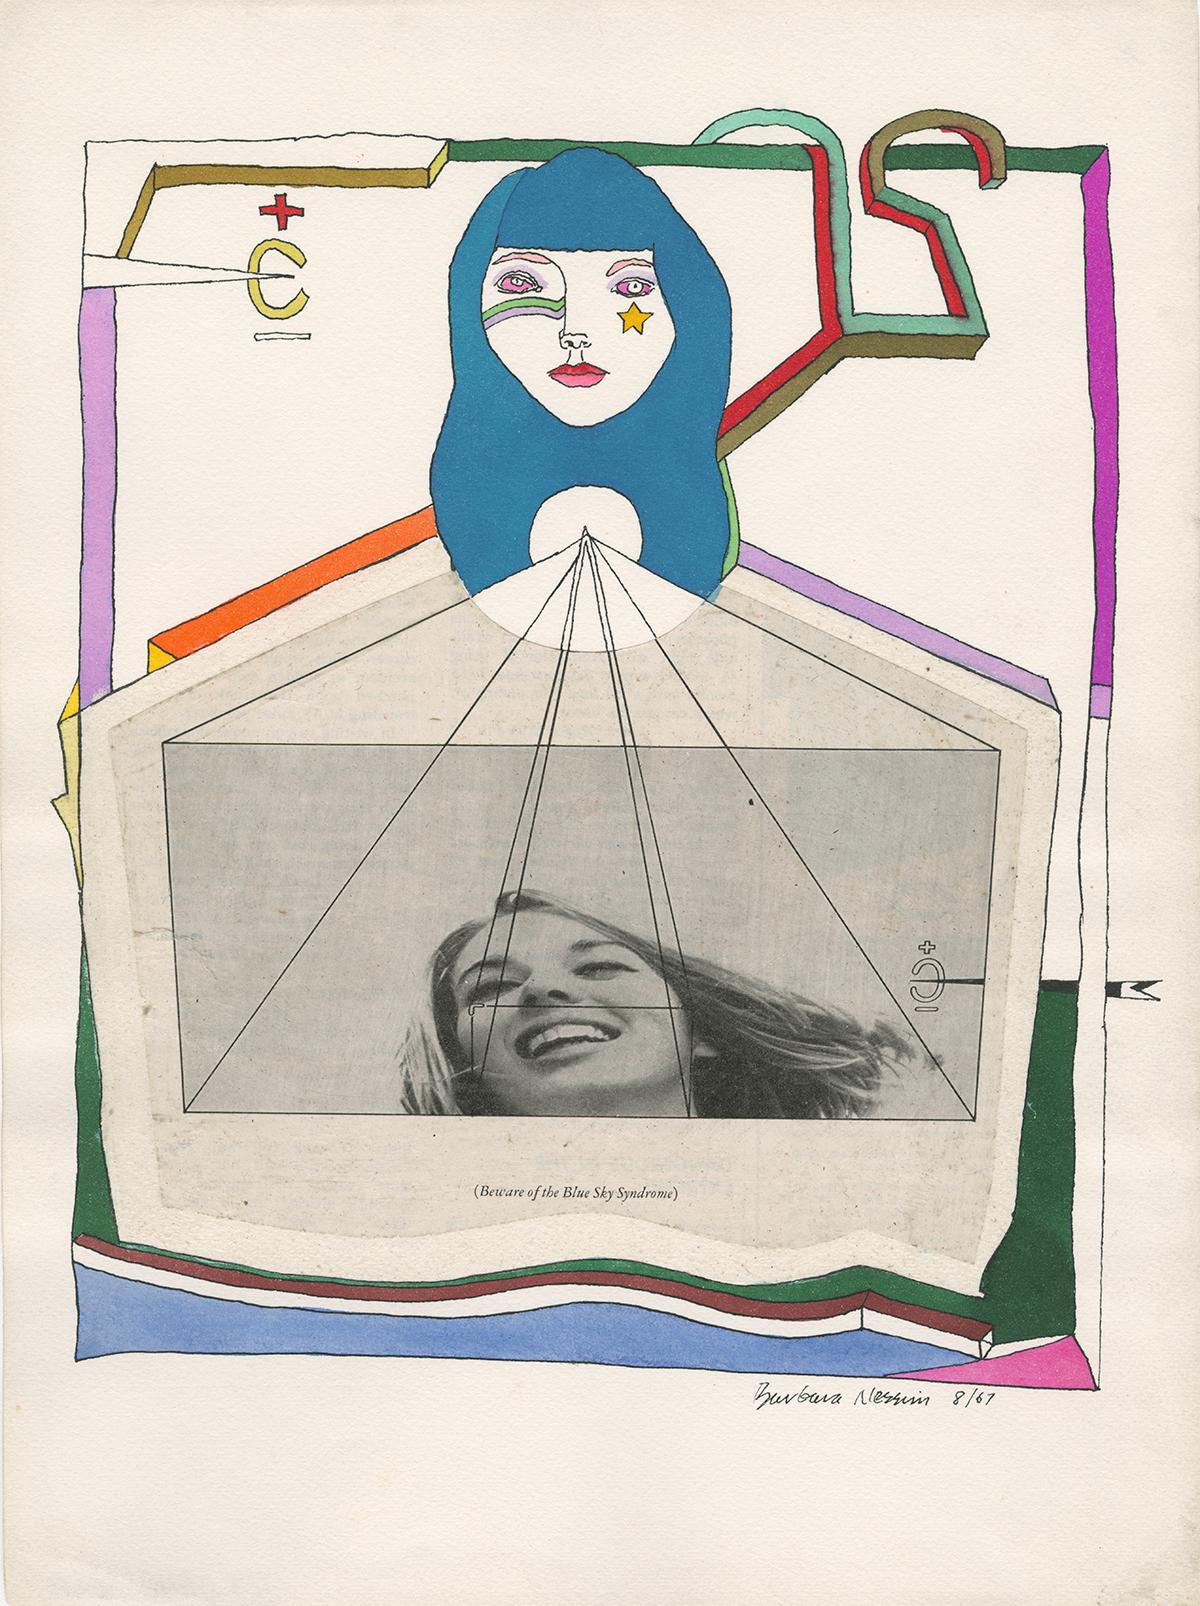 <i>Beware of the Blue Sky Syndrome</i>, 1967